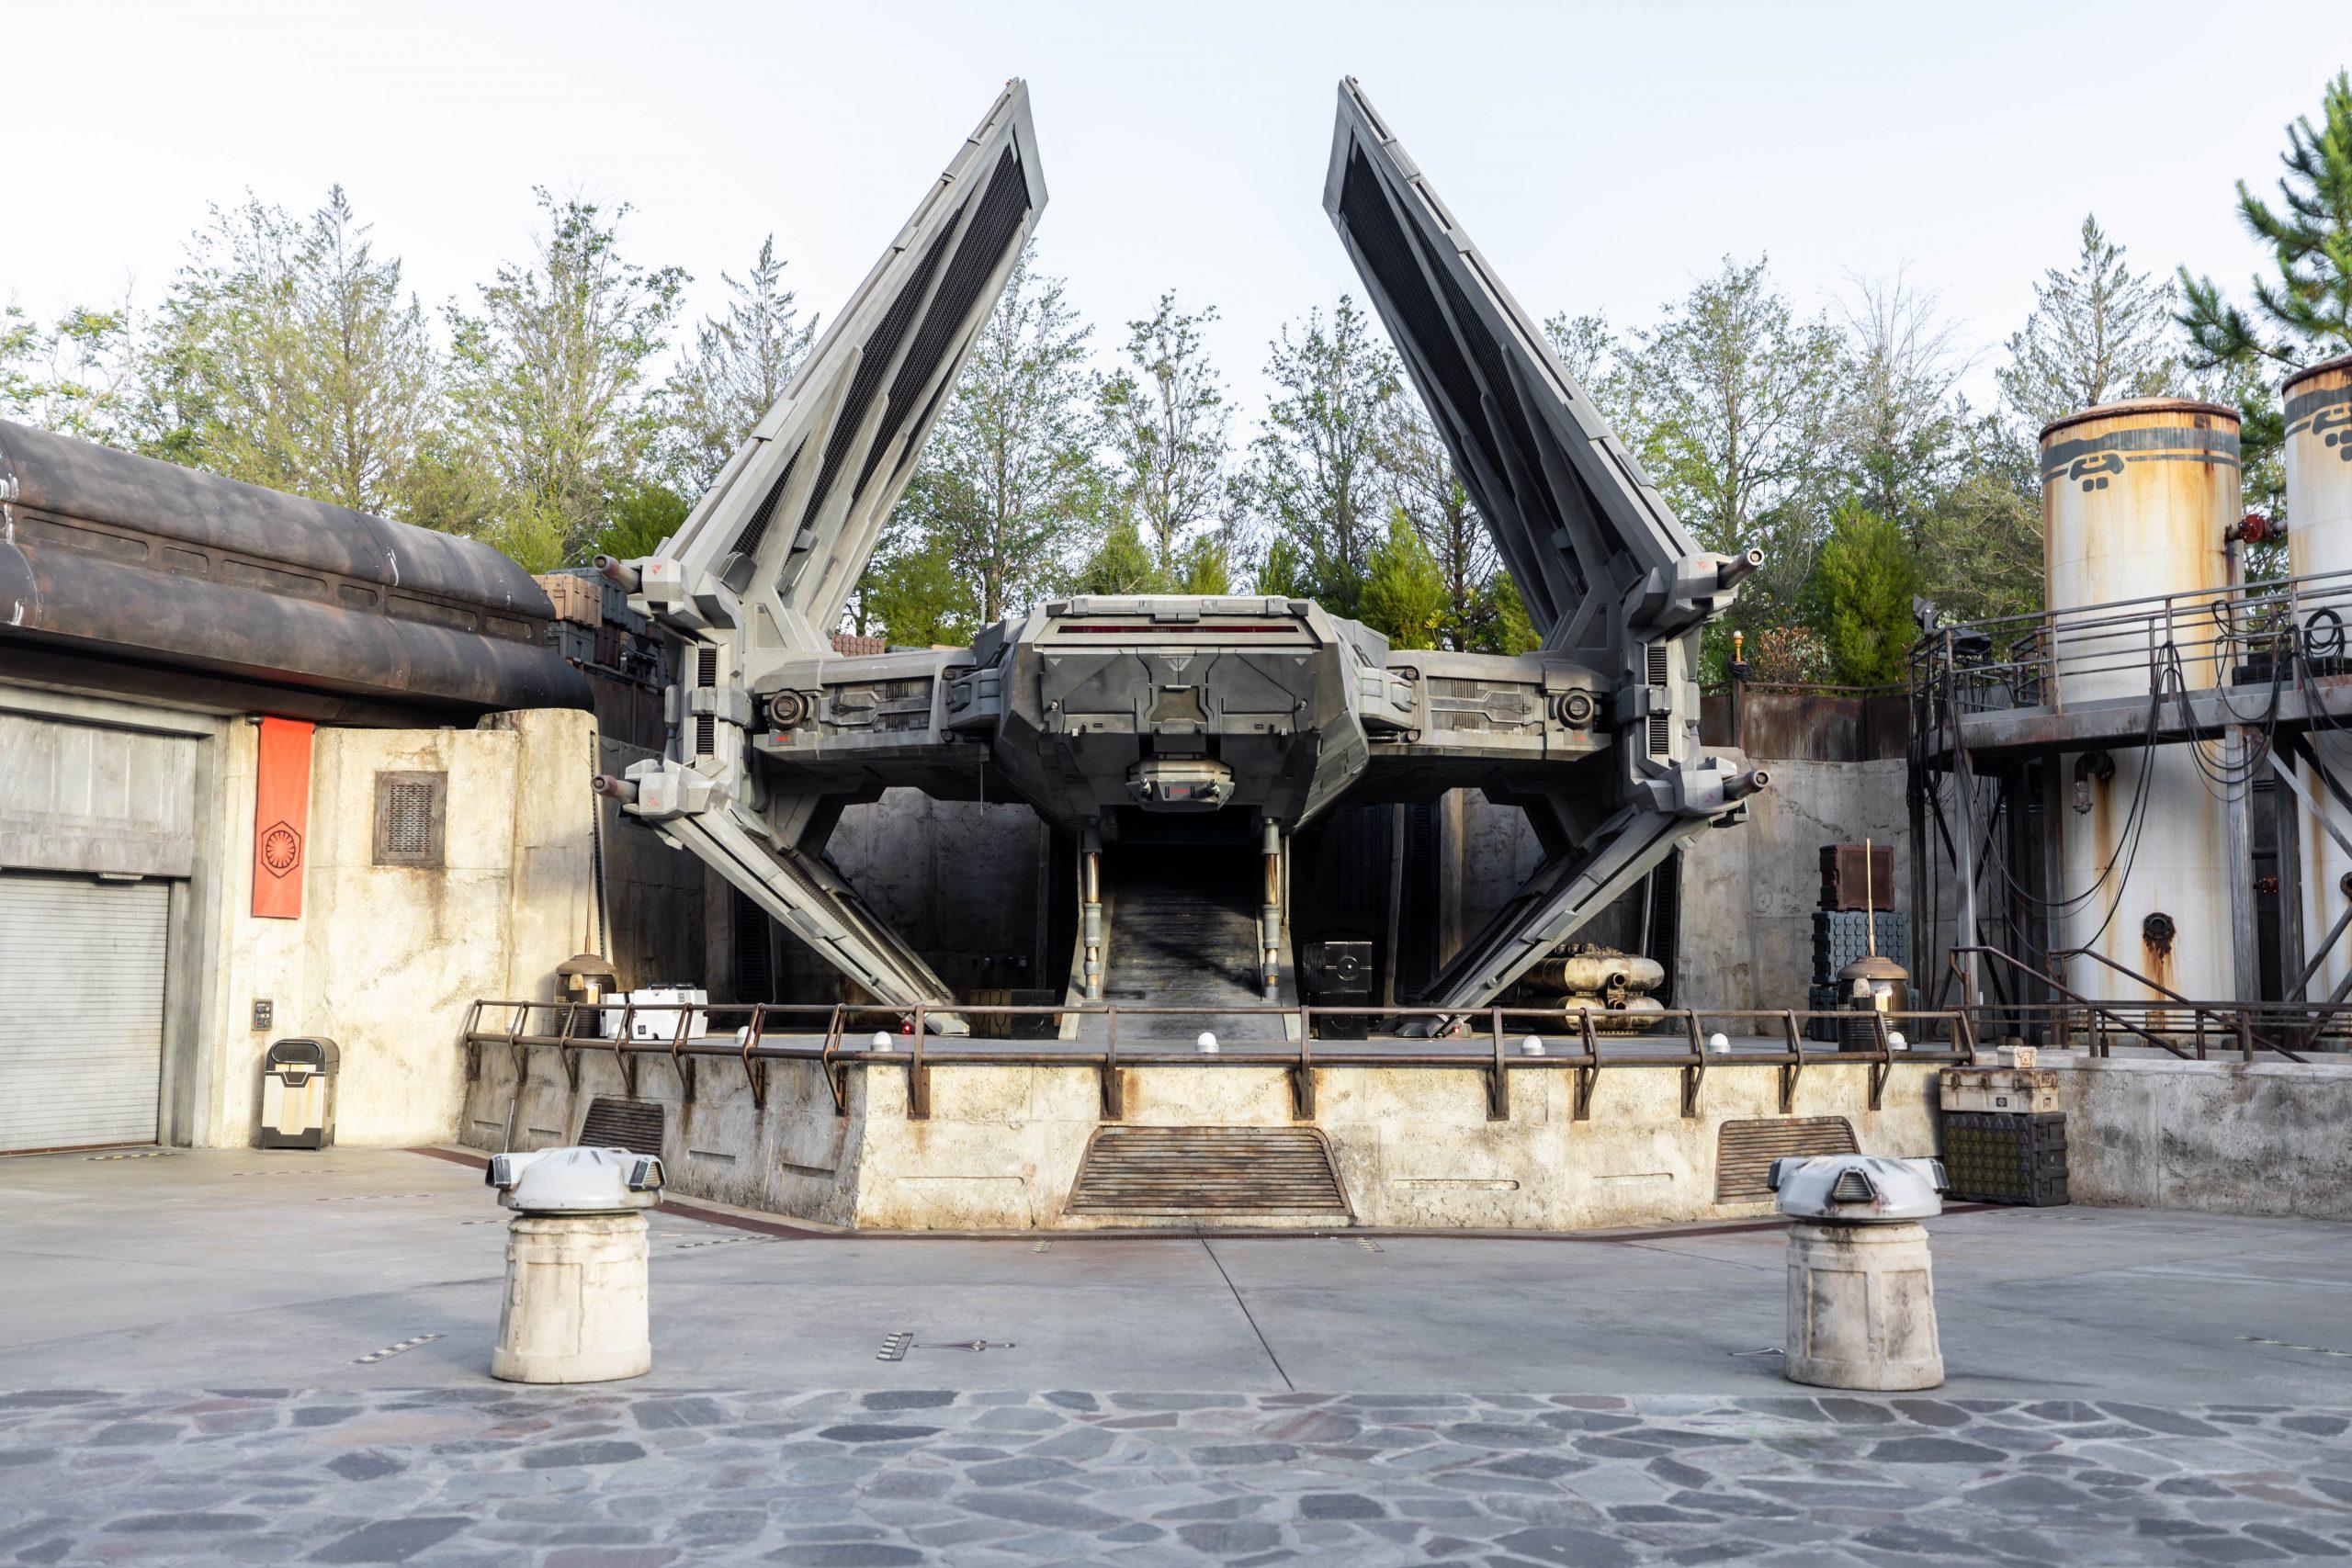 Private Tour of Galaxy's Edge Hollywood Studio Walt Disney World Annie Fairfax